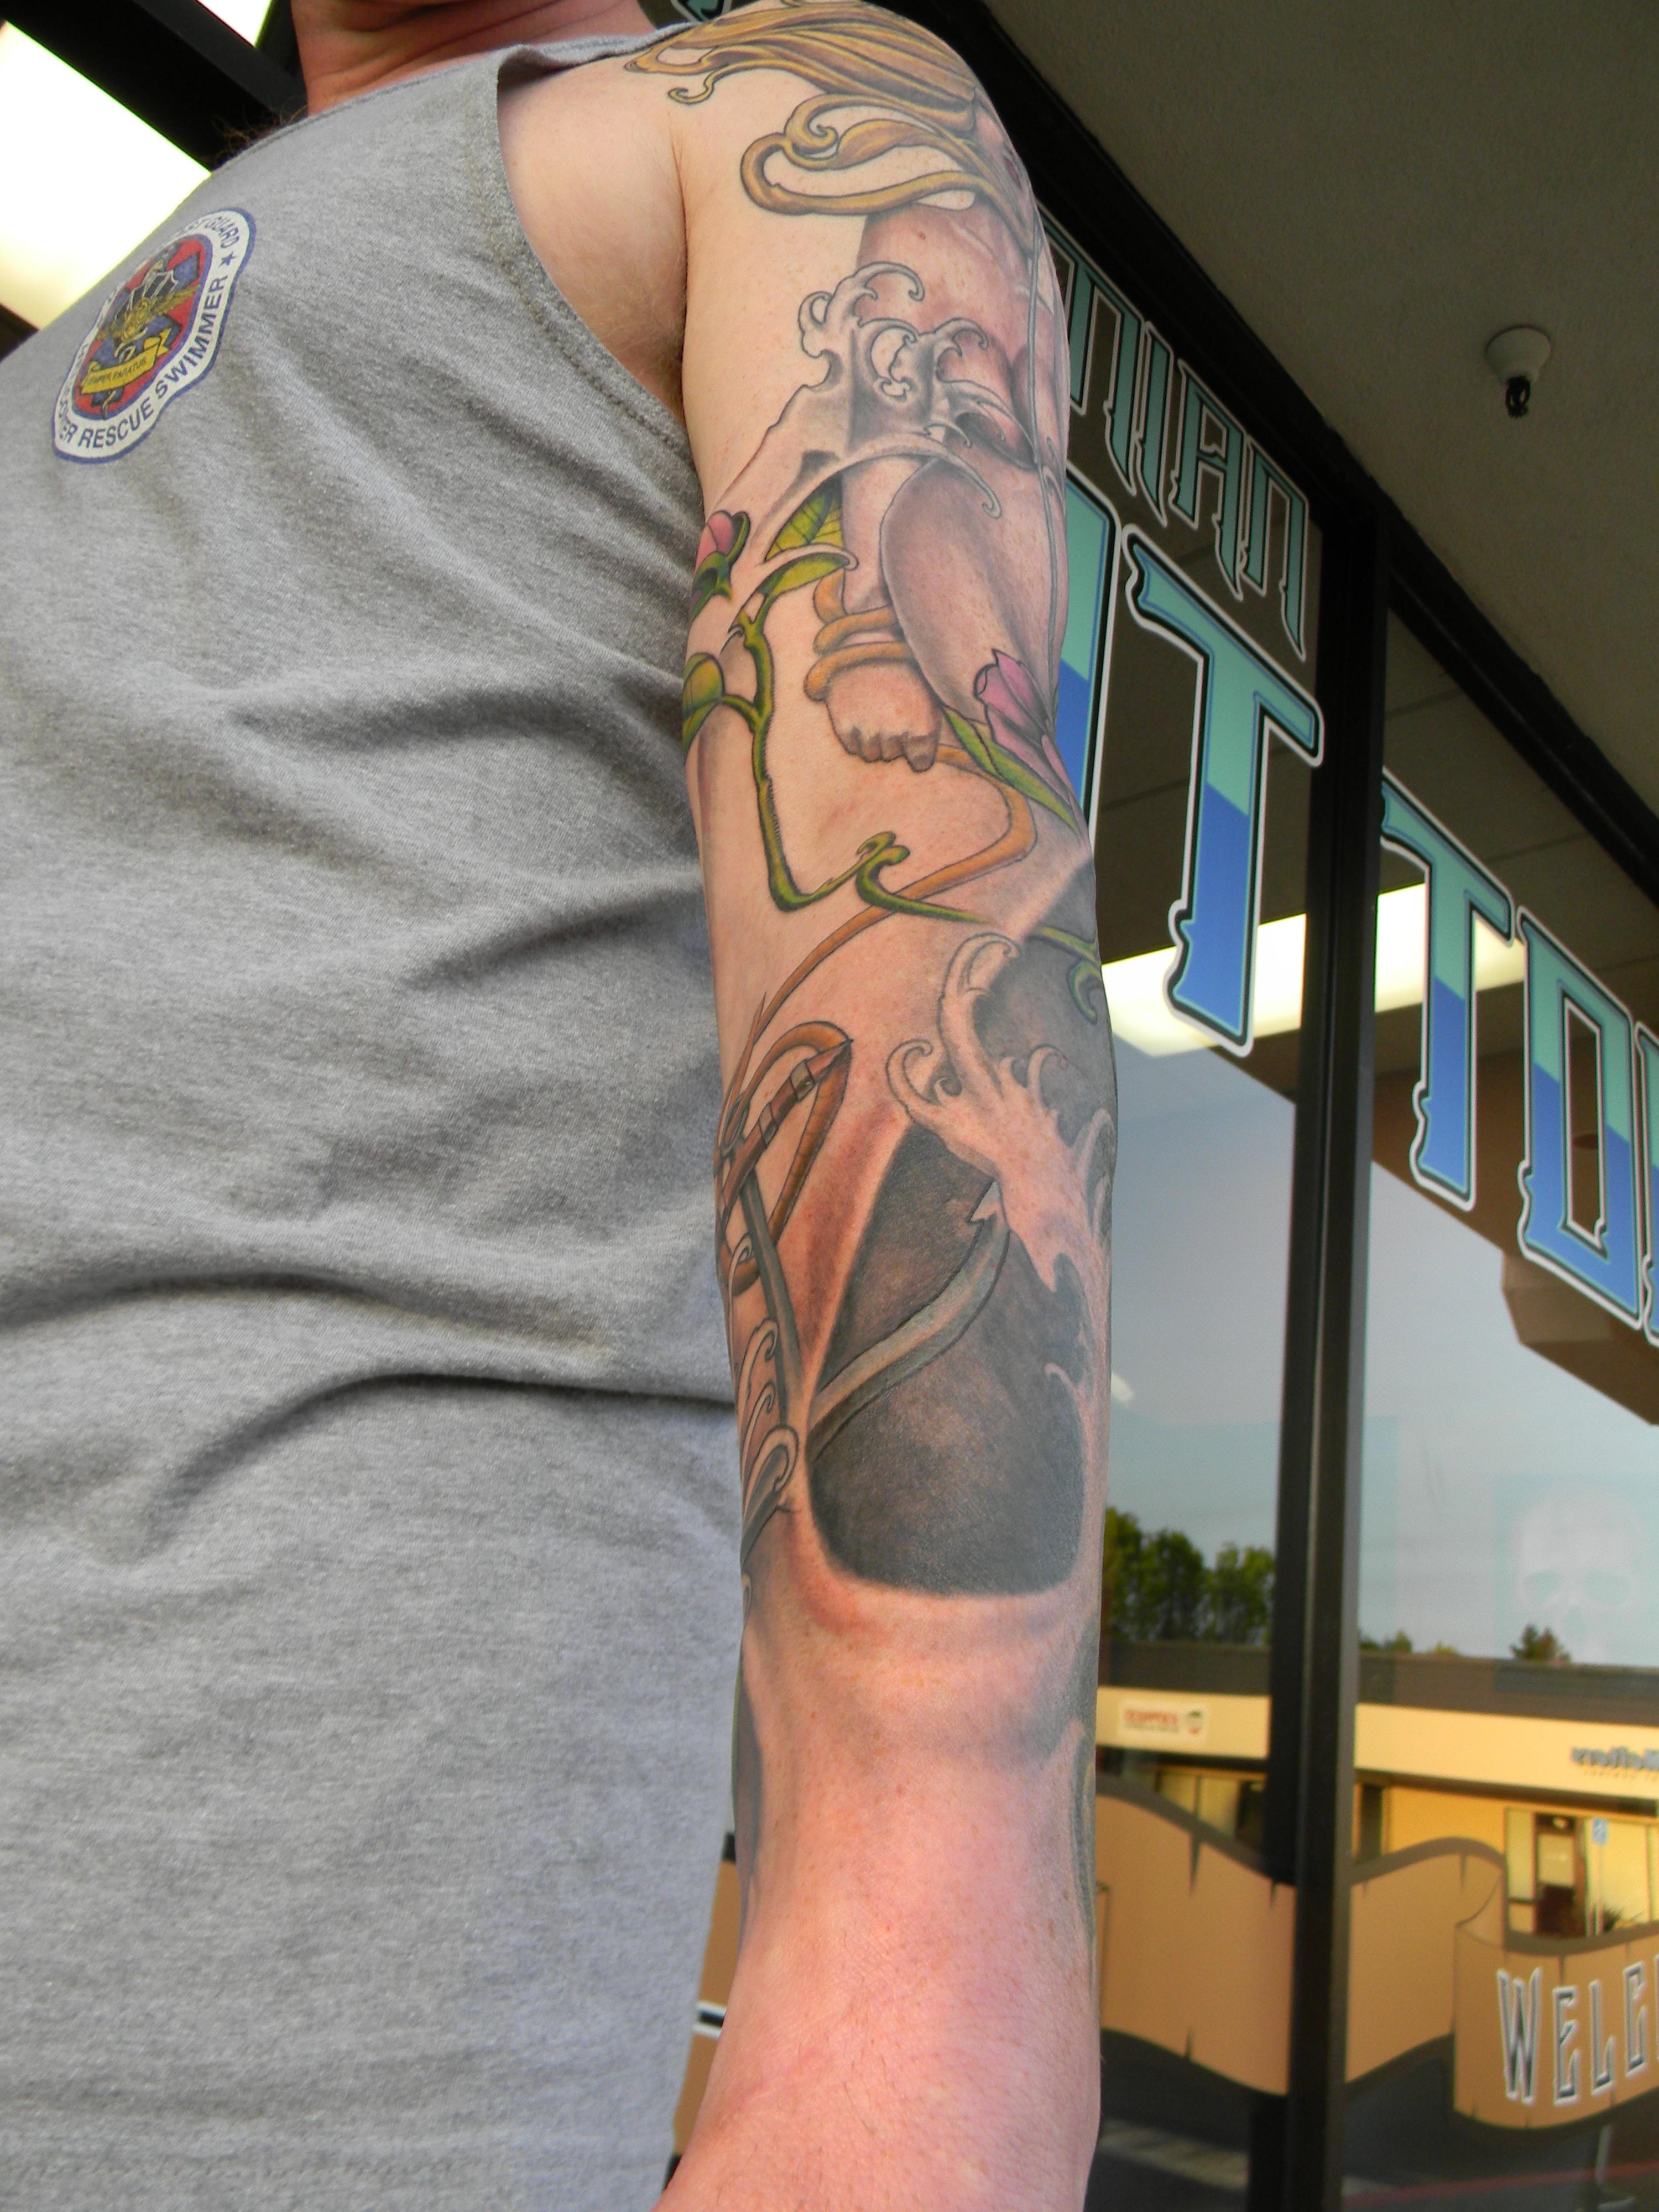 petaluma tattoo shop bohemian tattoo 1731 main st